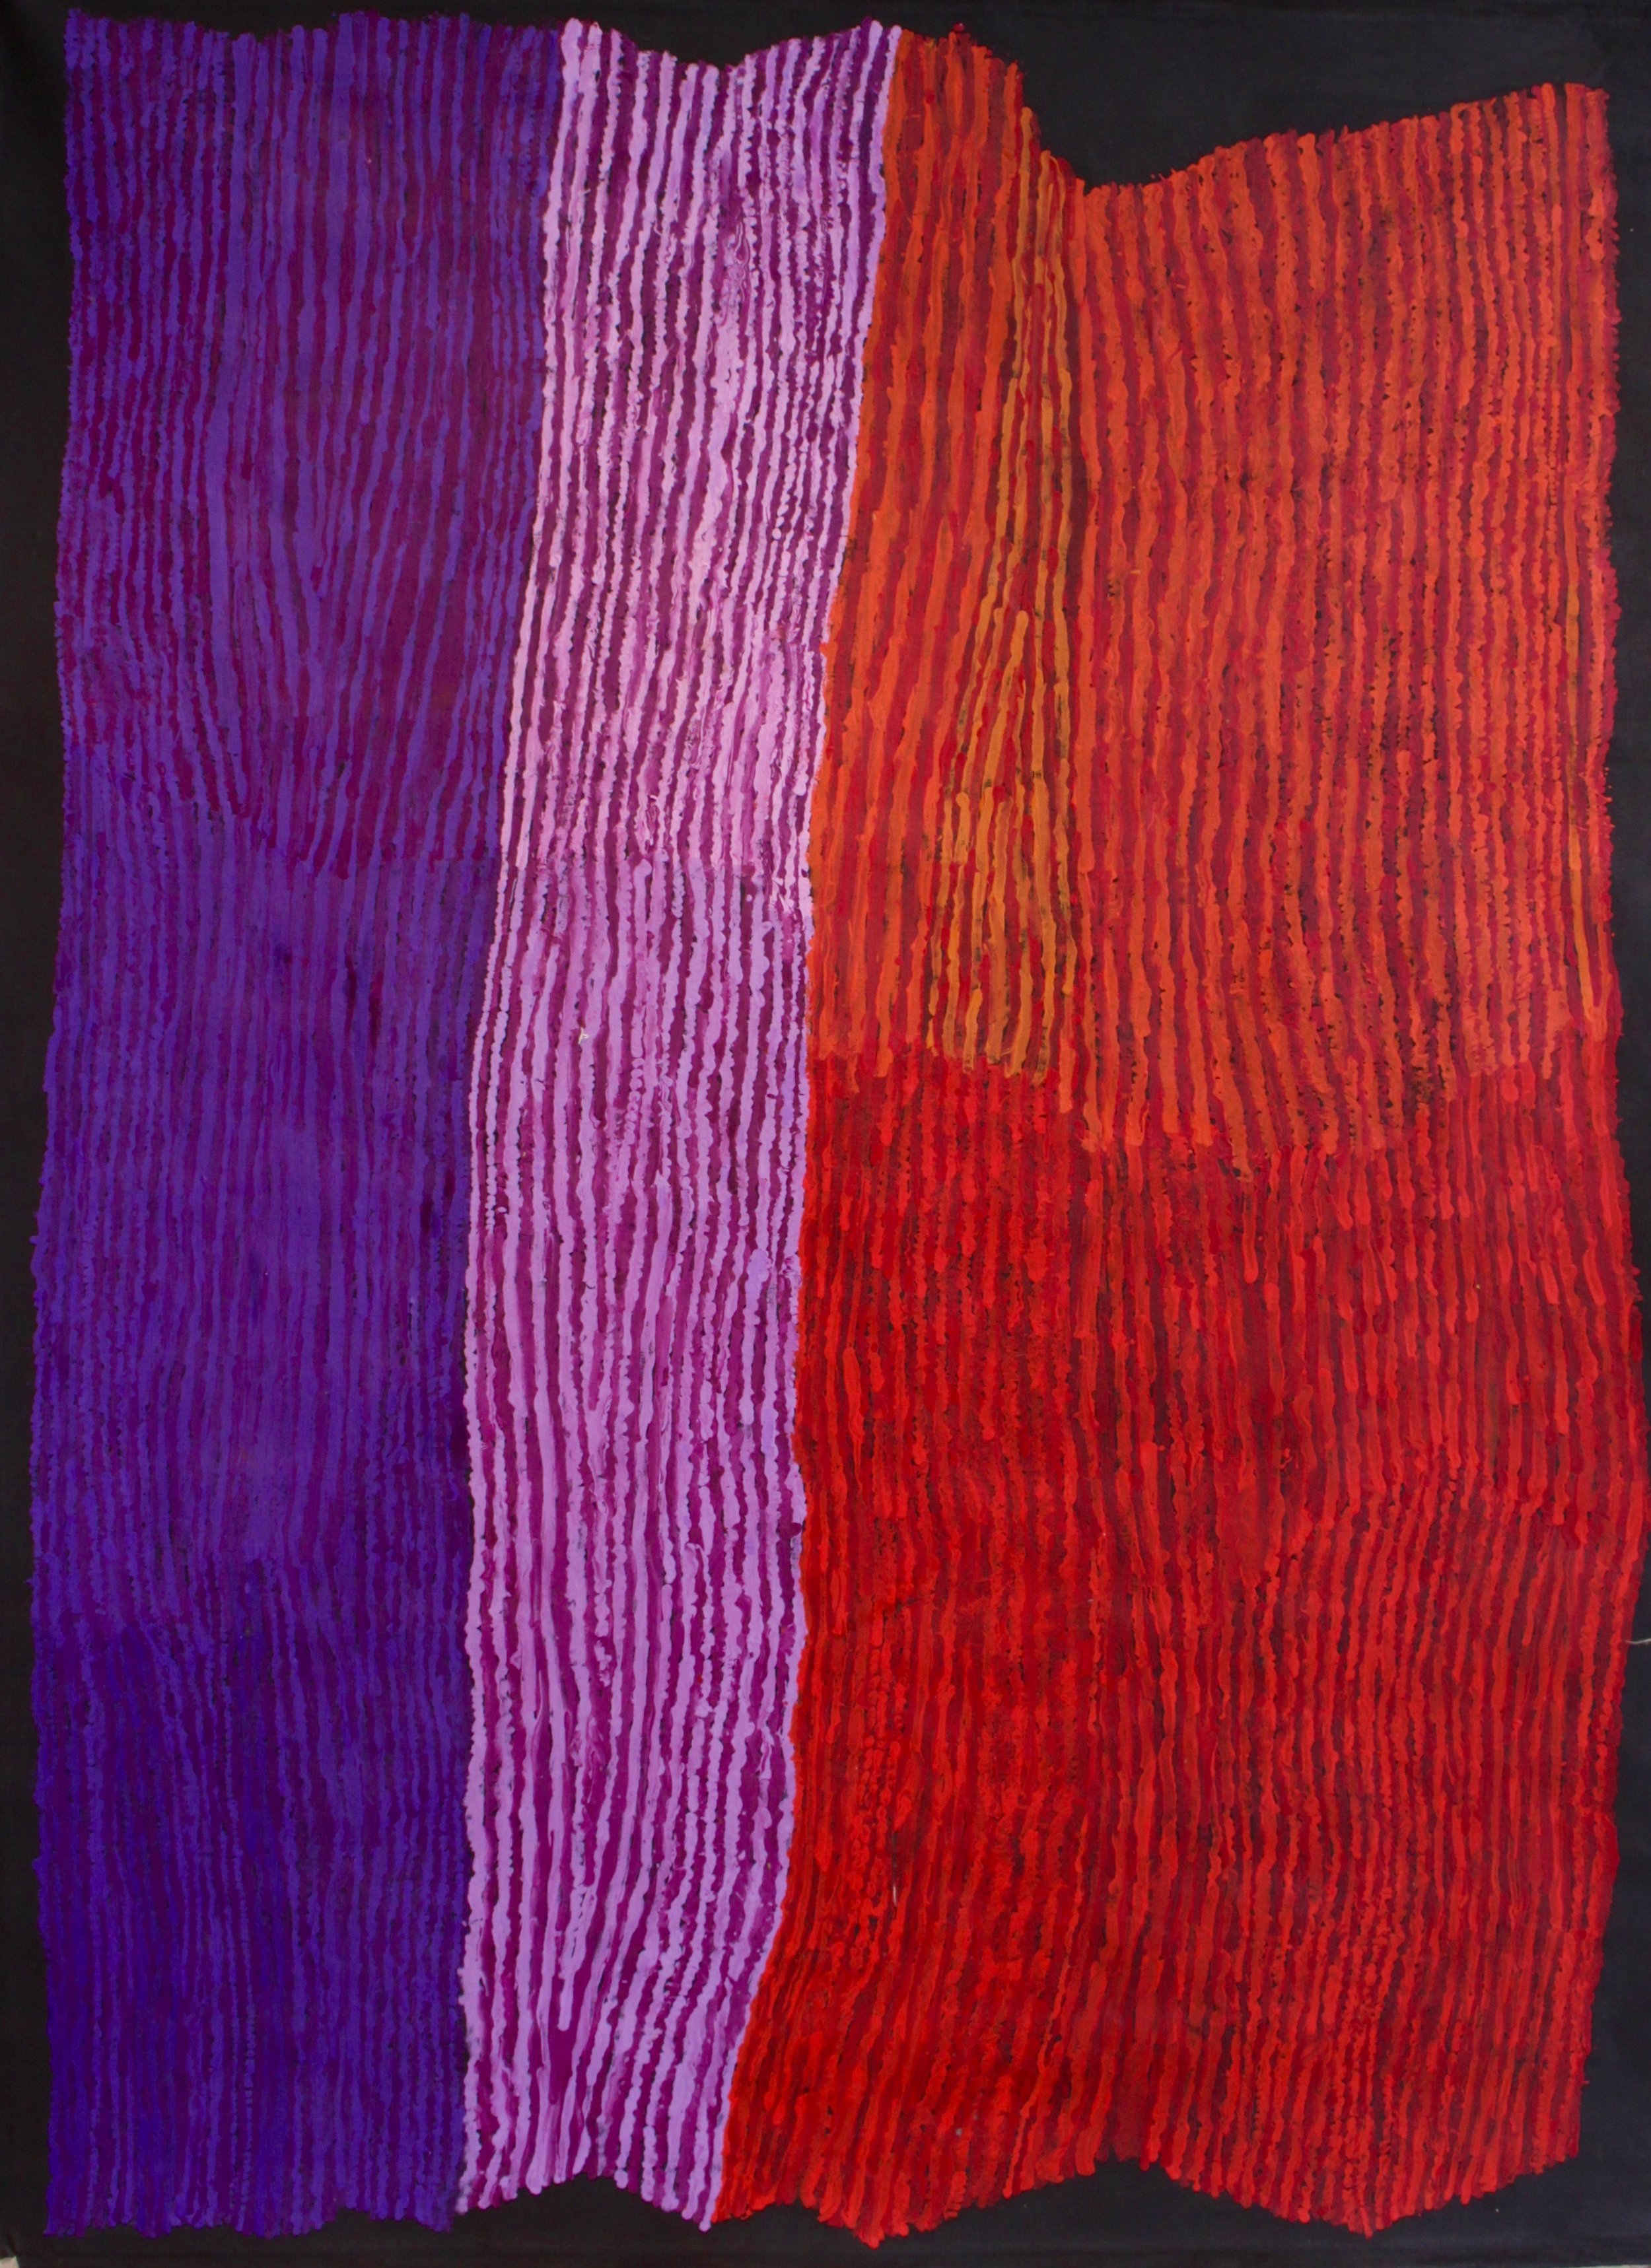 "Ray Ken  Tali - Sand dune  Acrylic on Belgian linen 78"" x 60"" (198 x 152.5 cm) Tjala Arts Catalog #392-16   EMAIL INQUIRY"